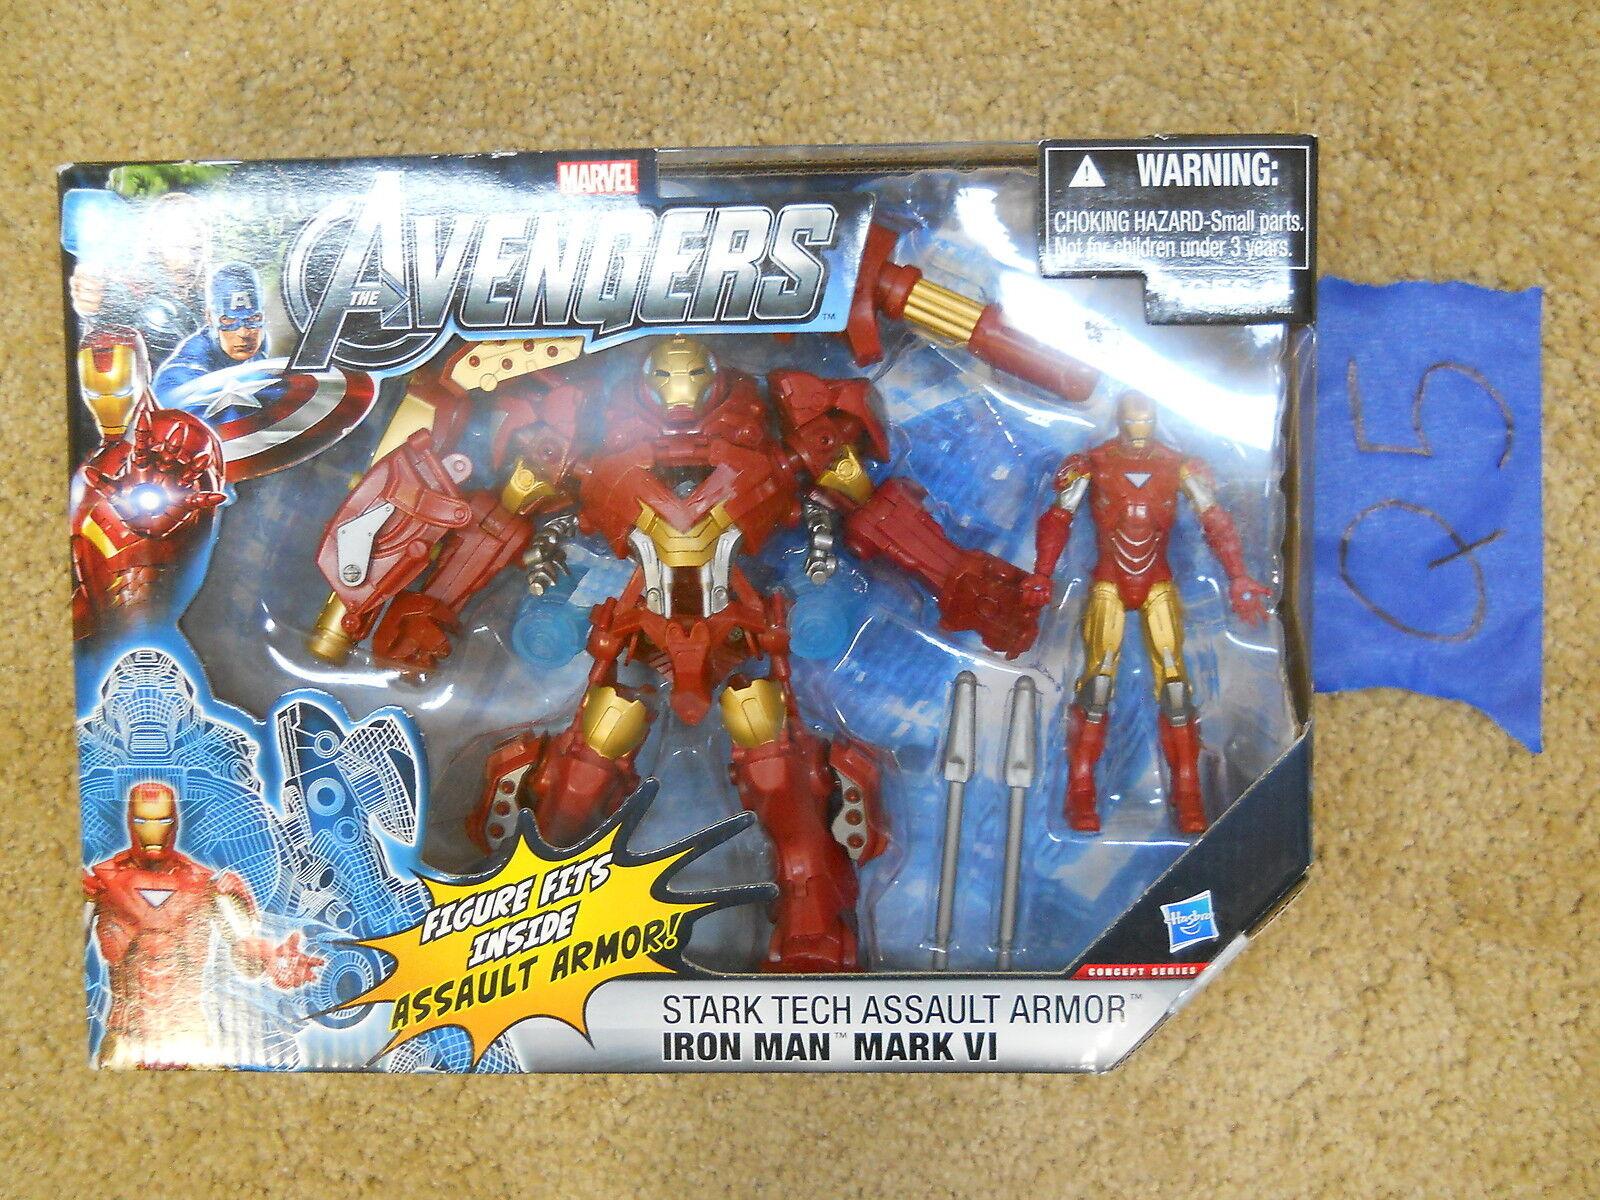 Q5_9 Hasbro Marvel Universe AVENGERS 2 IRON MAN MARK VI SternK TECH ASSAULT ARMOR